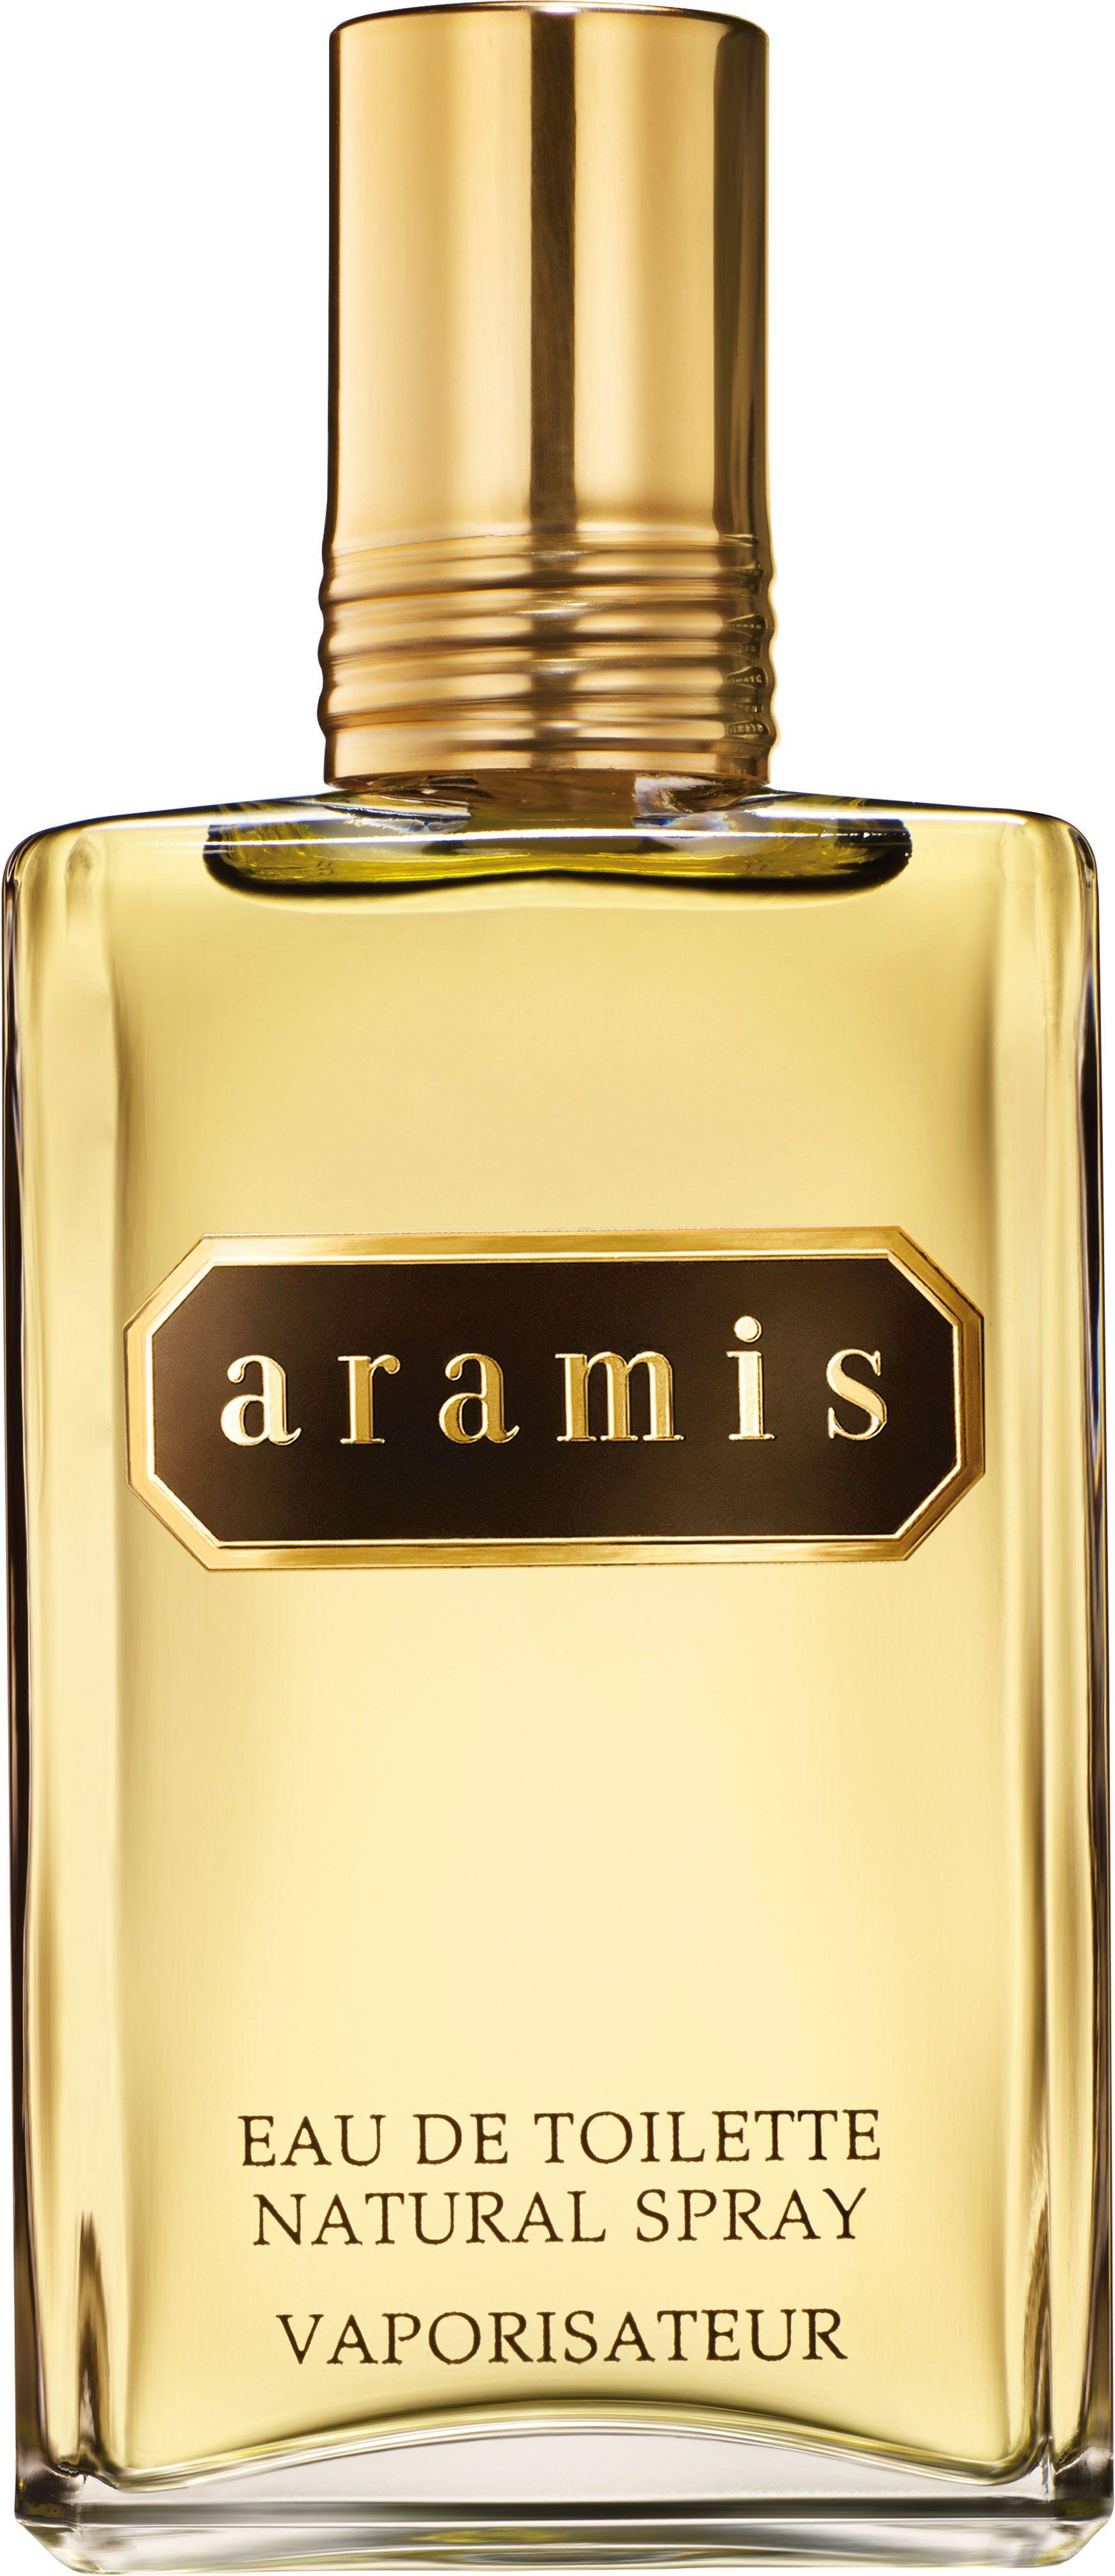 Aramis Classic EDT Spray, 60 ml